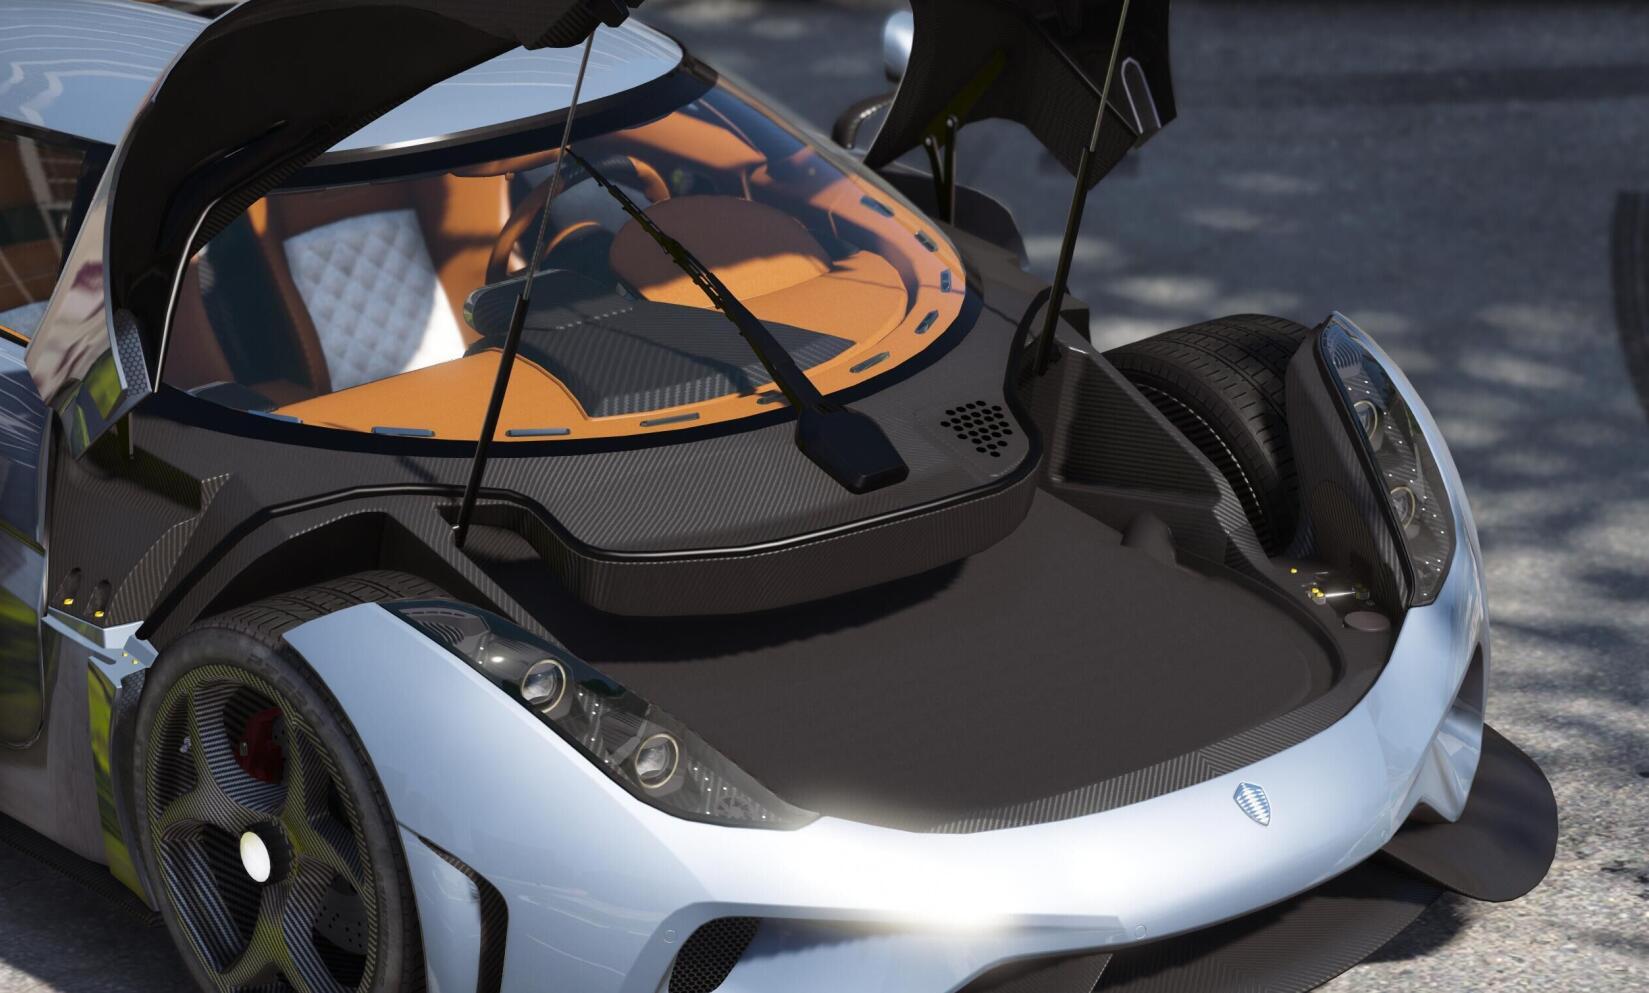 Koenigsegg Regera 2016 [Add-On] - GTA5-Mods.com